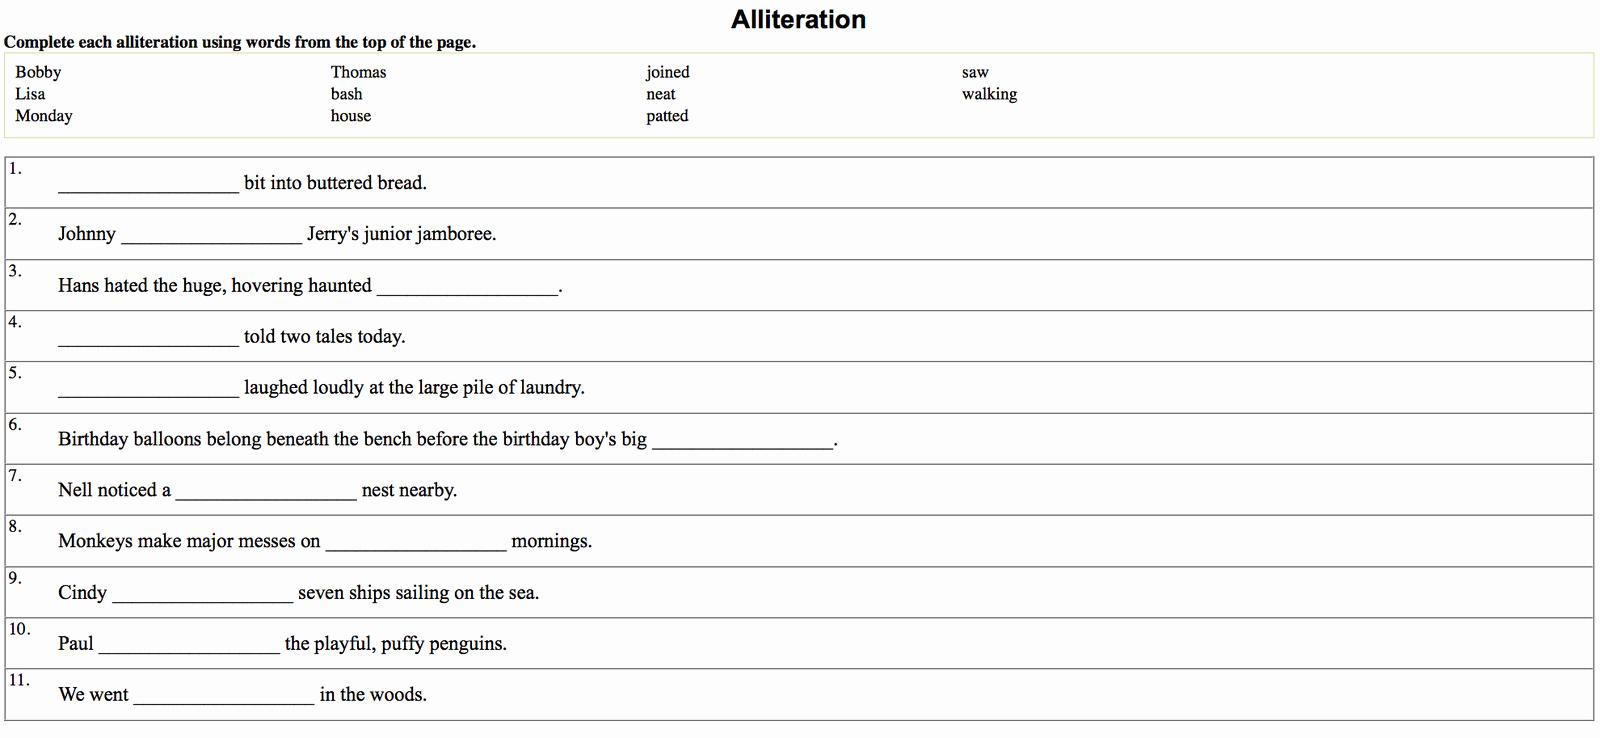 Alliteration Worksheets 4th Grade Inspirational 4th Graders Alliteration